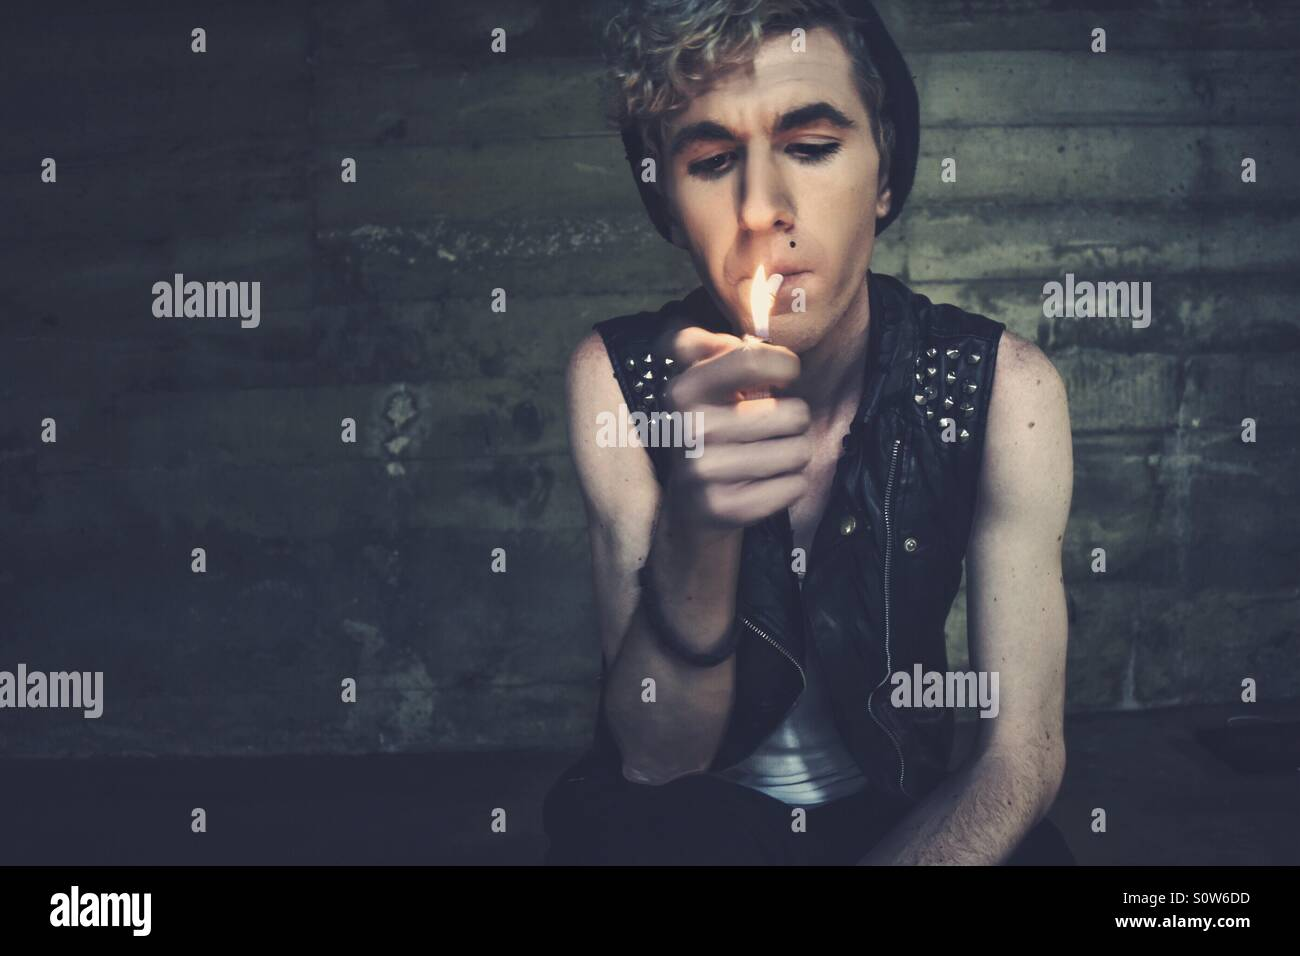 Jeune gamin en cuir gilet allumer une cigarette. Photo Stock